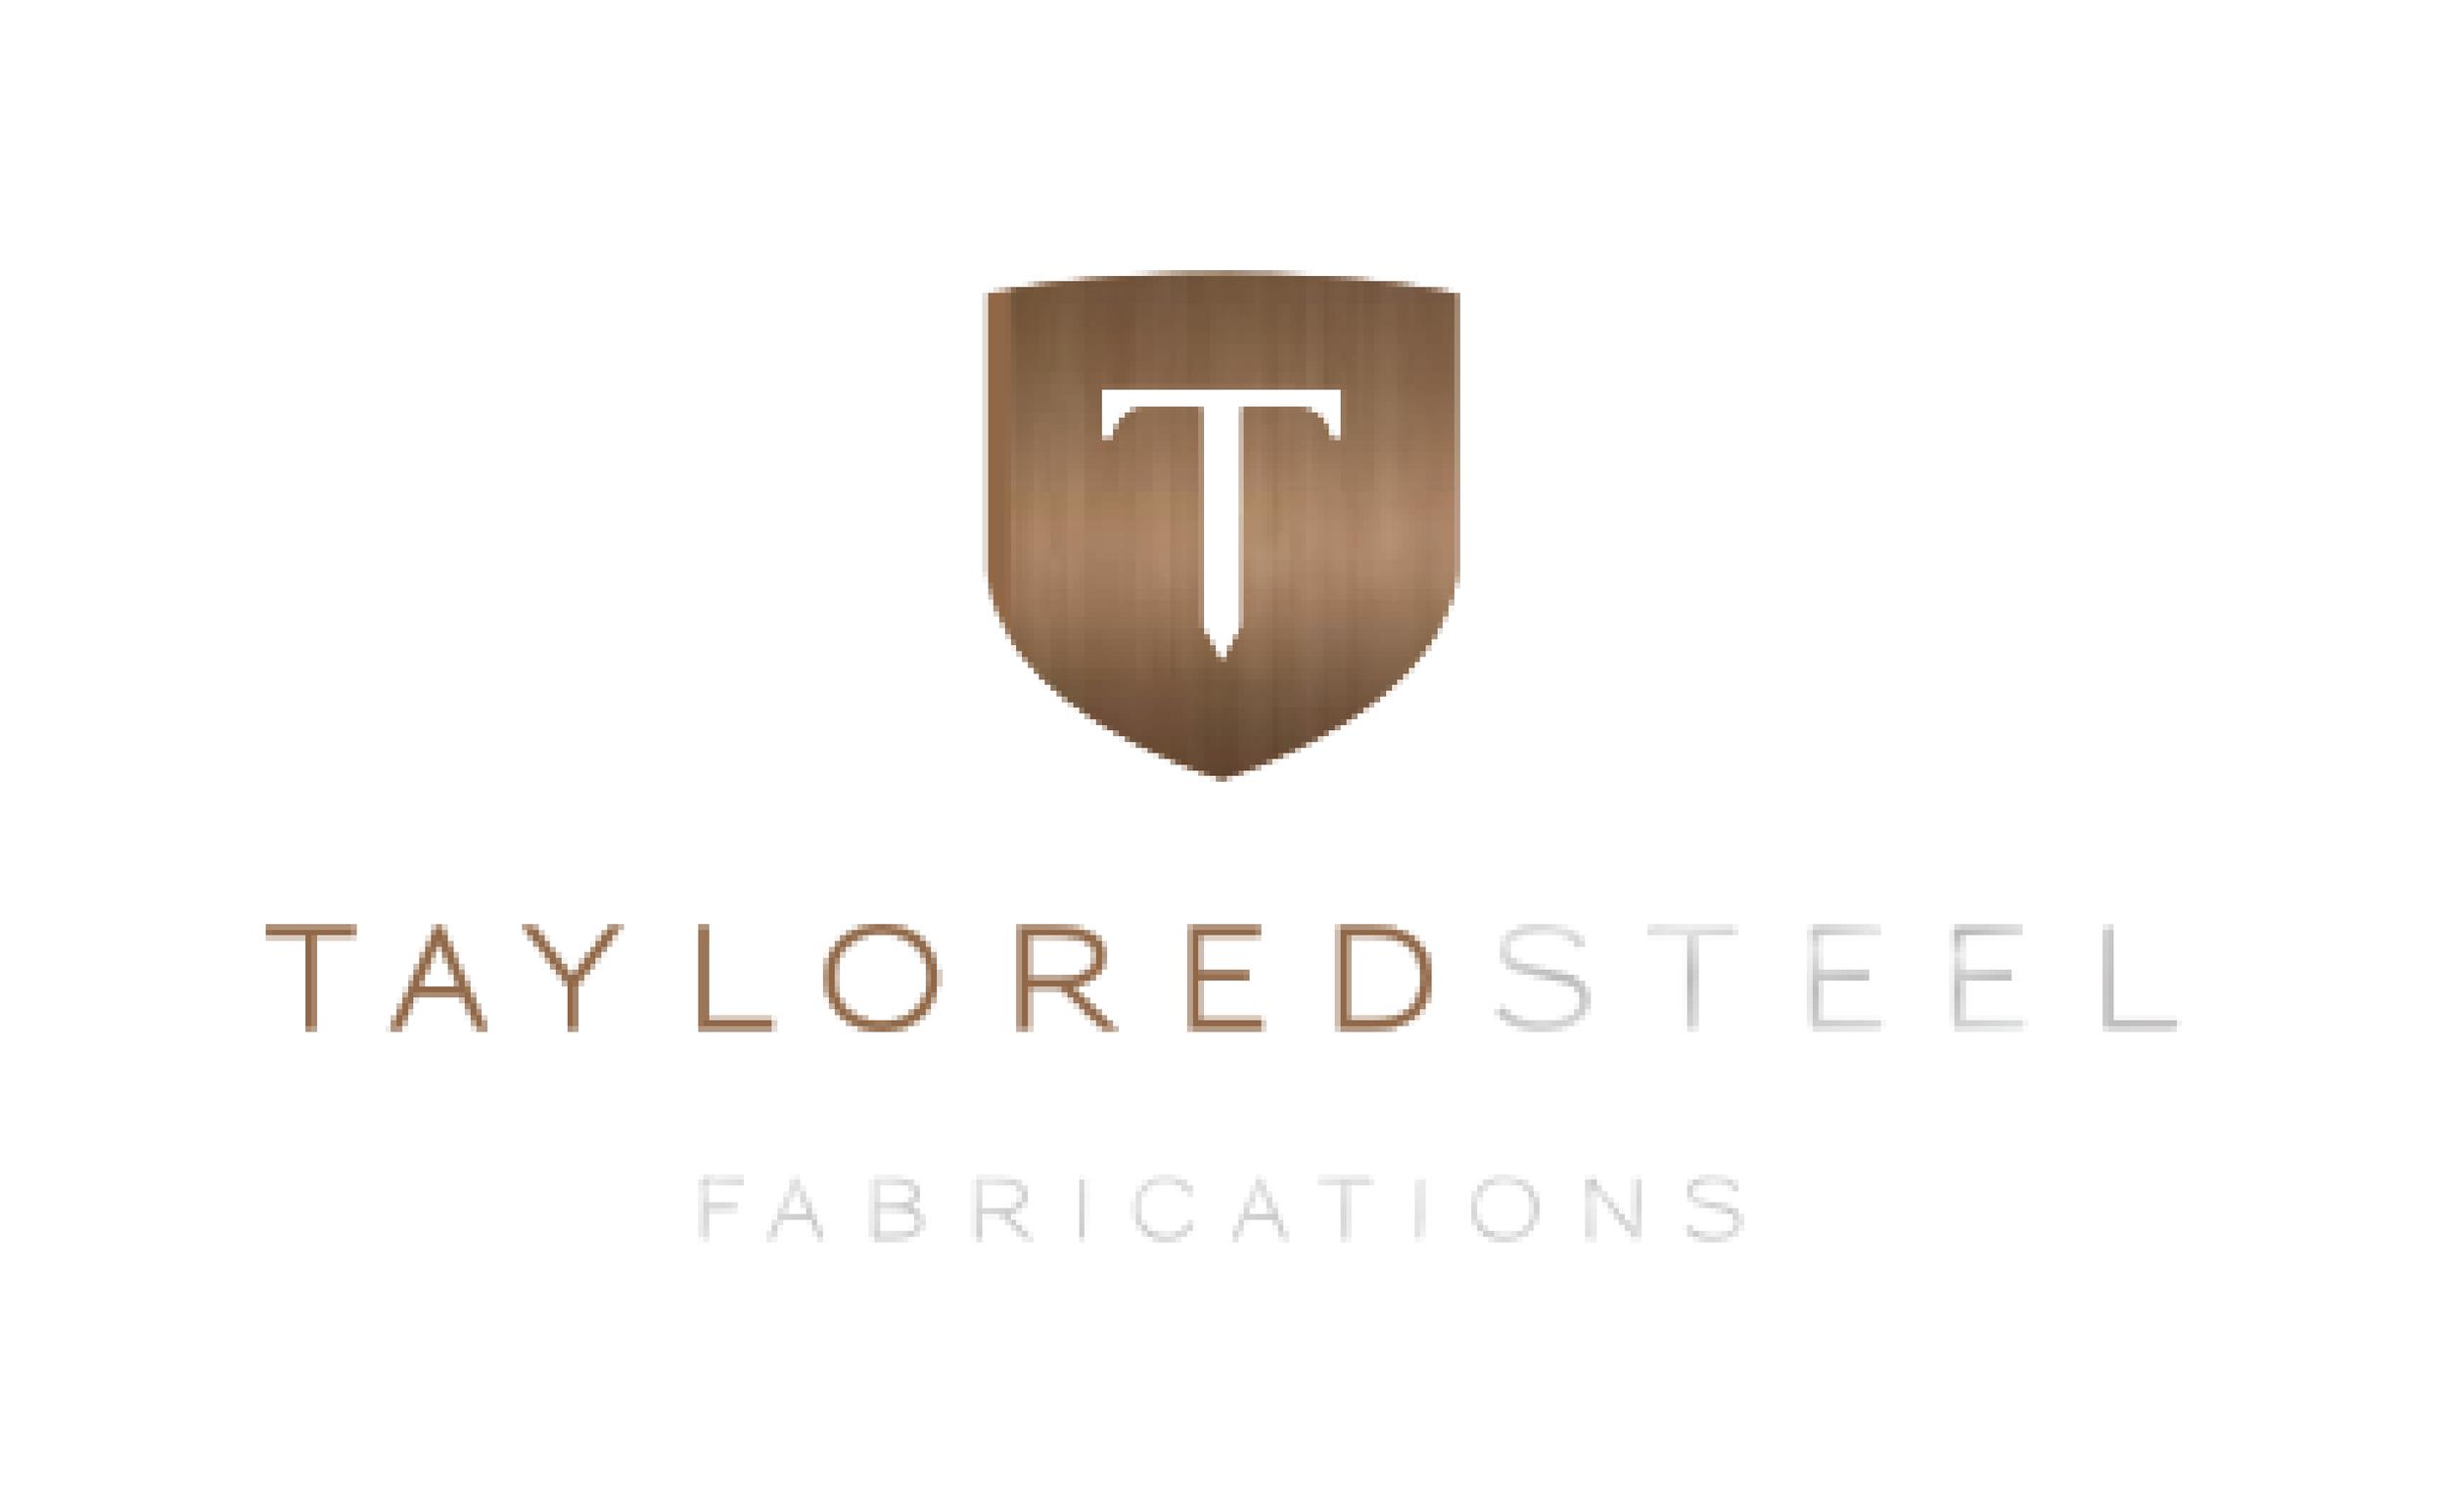 Taylored Steel Fabrications